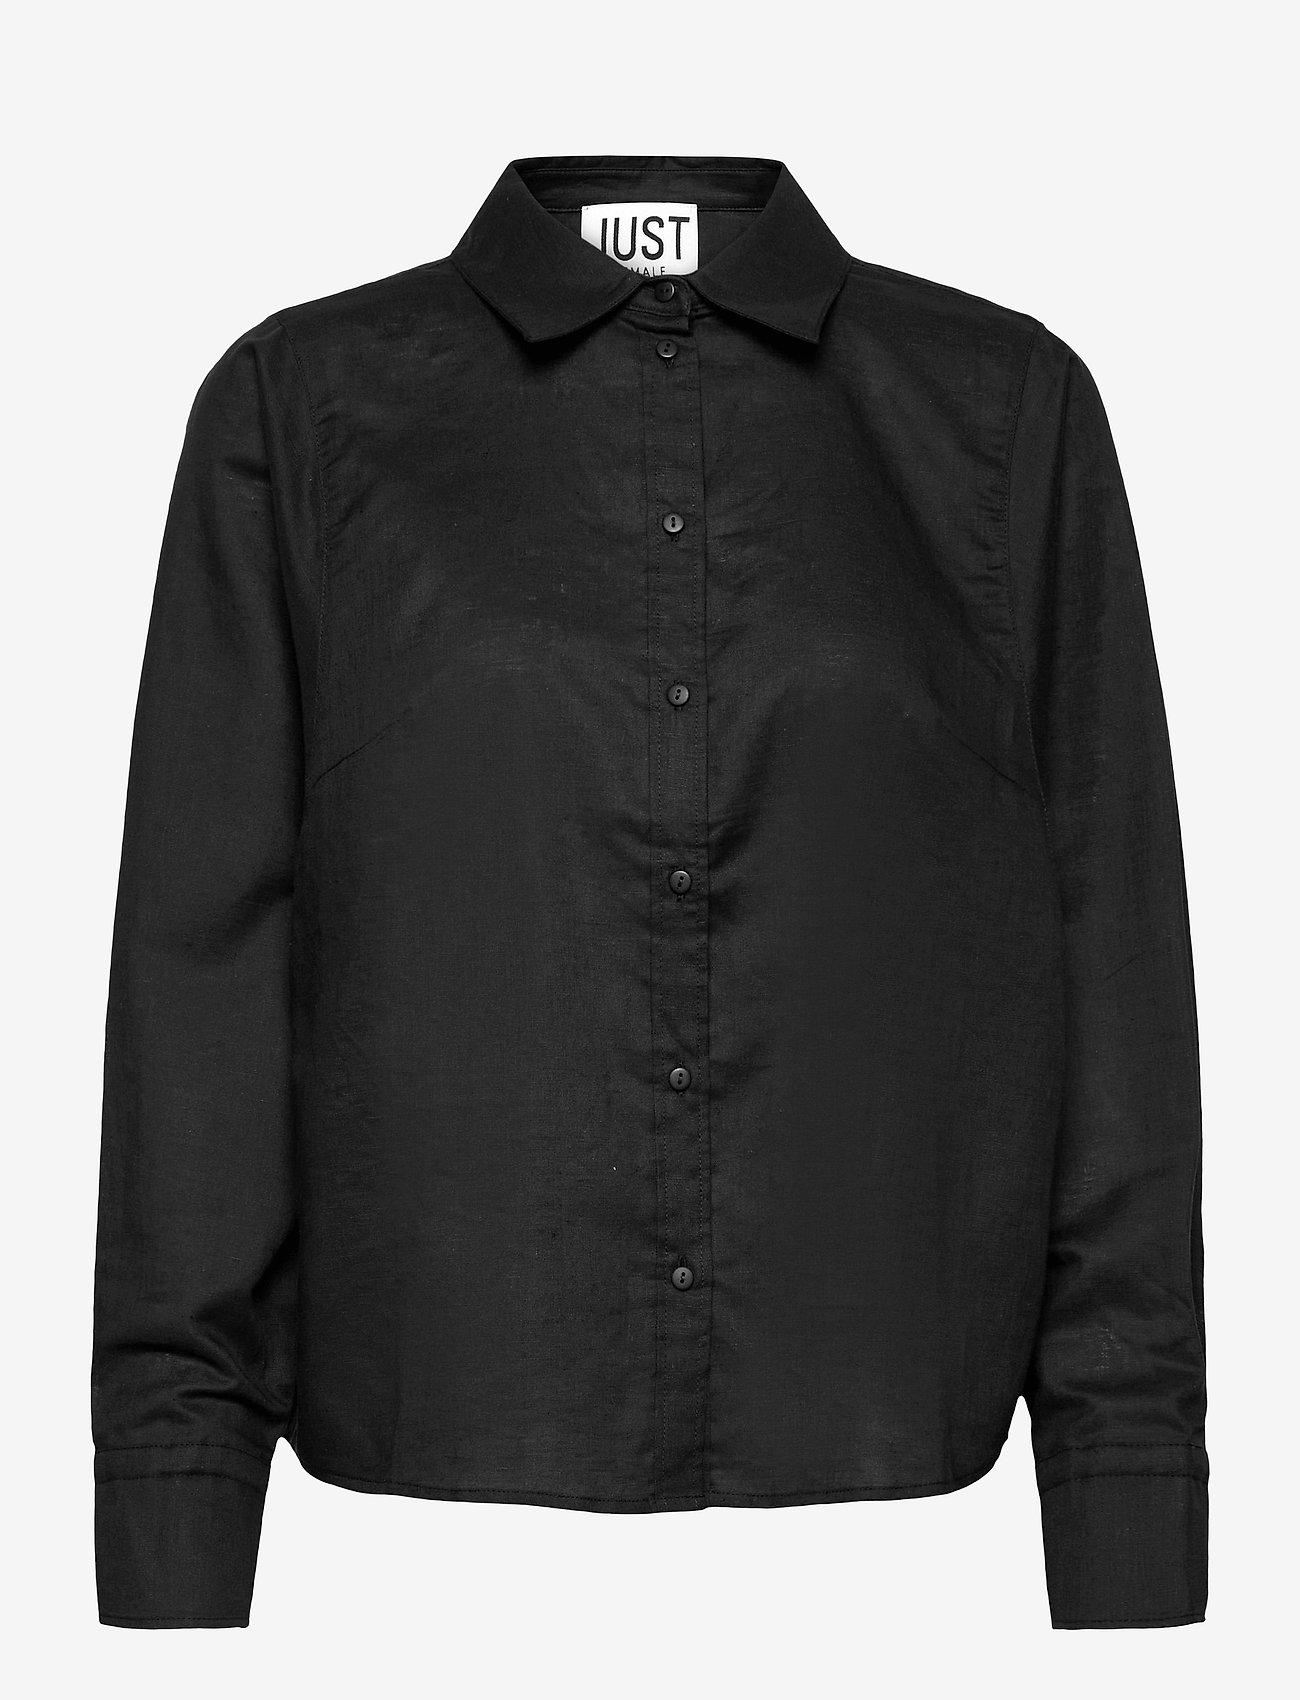 Just Female - Collin shirt - long-sleeved shirts - black - 0